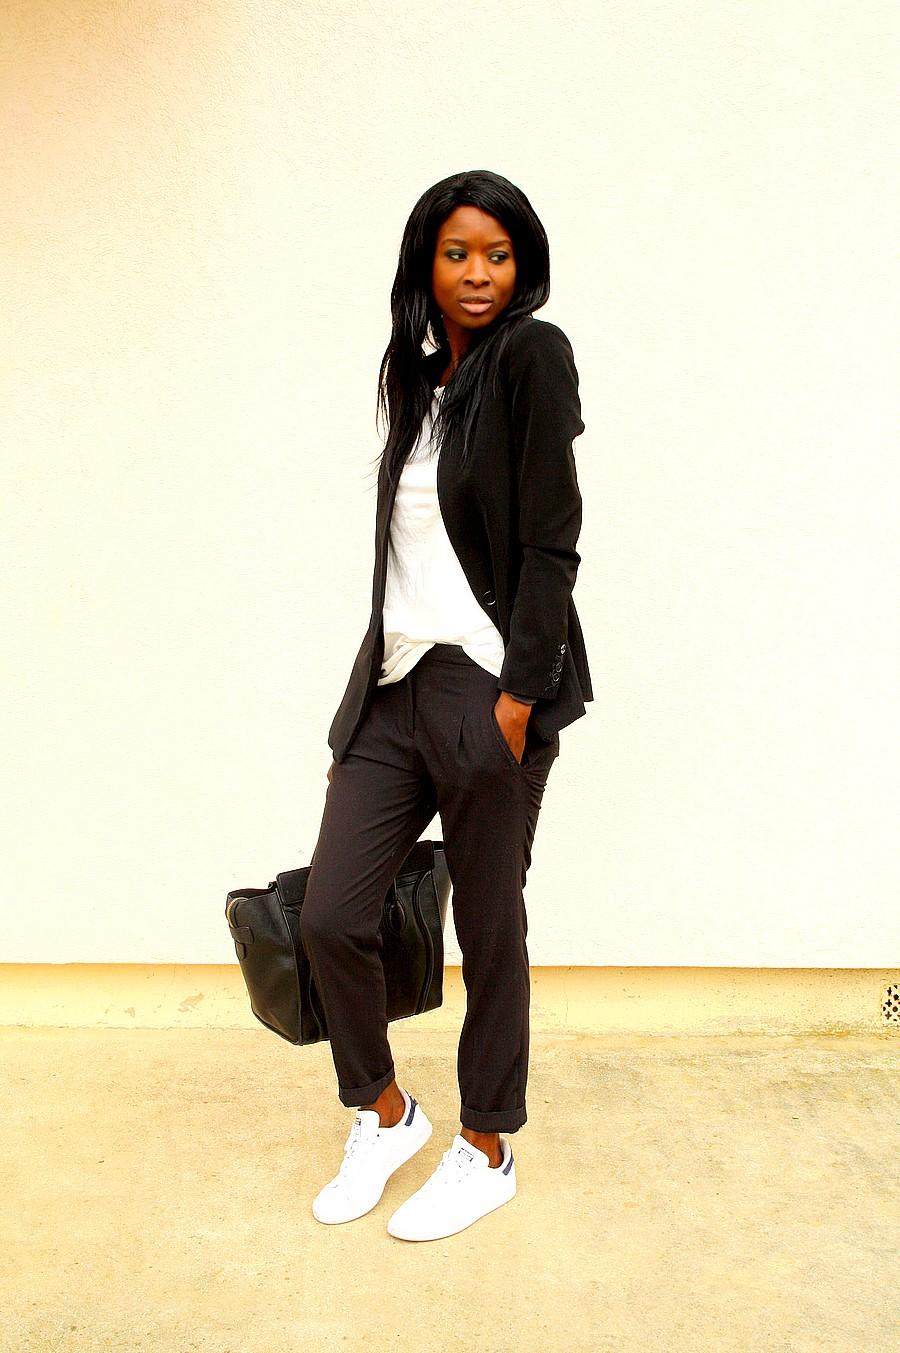 tailleur-baskets-adidas-stan-smith-sac-celine-luggage-blog-mode